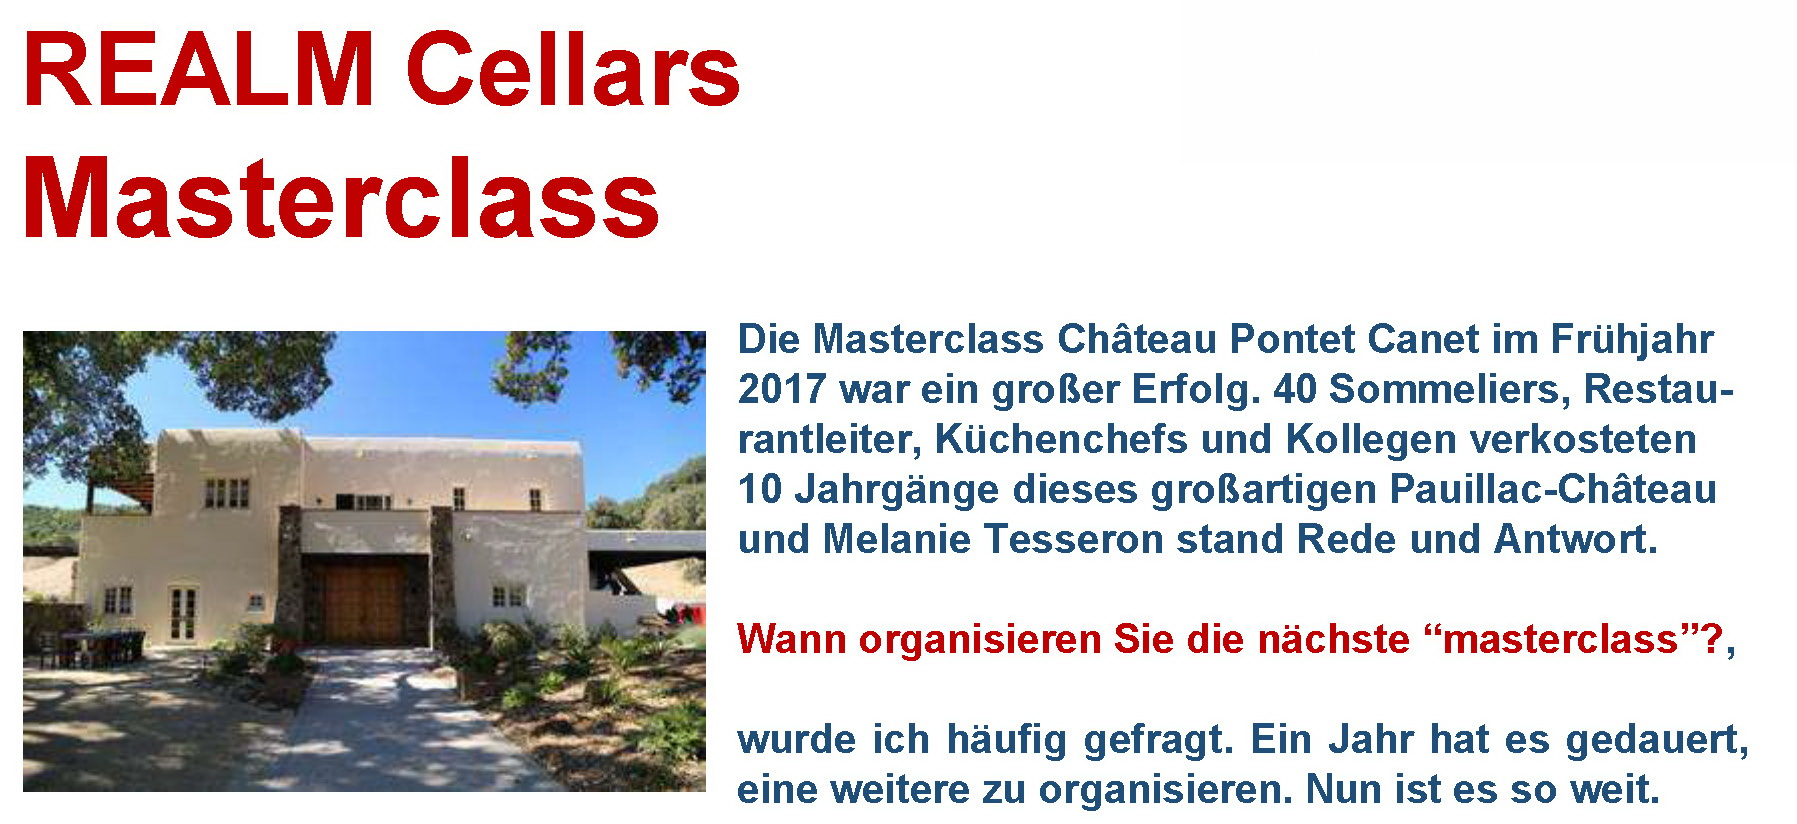 REALM Cellars Masterclass